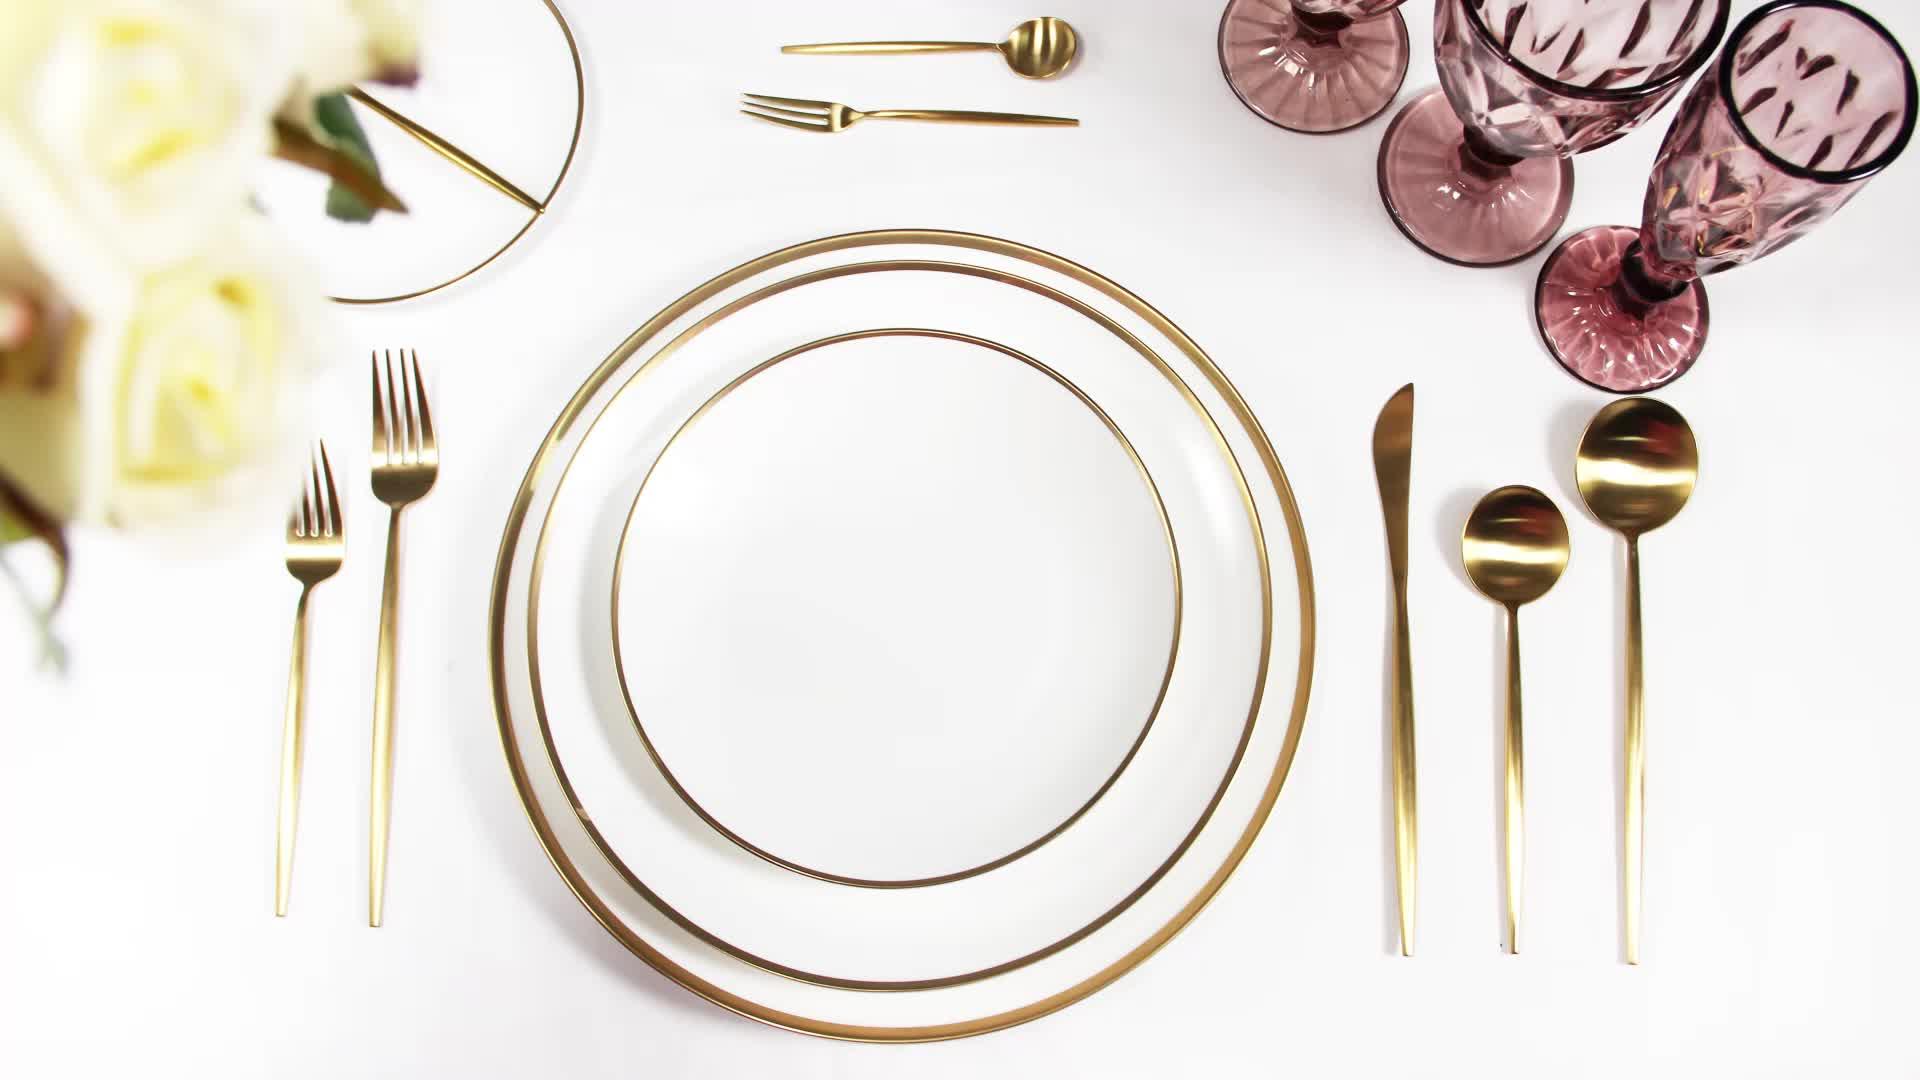 Beste Verkauf Dinner Parties Hochzeit PS Gold Umrandeten Keramik Ladegerät Platten